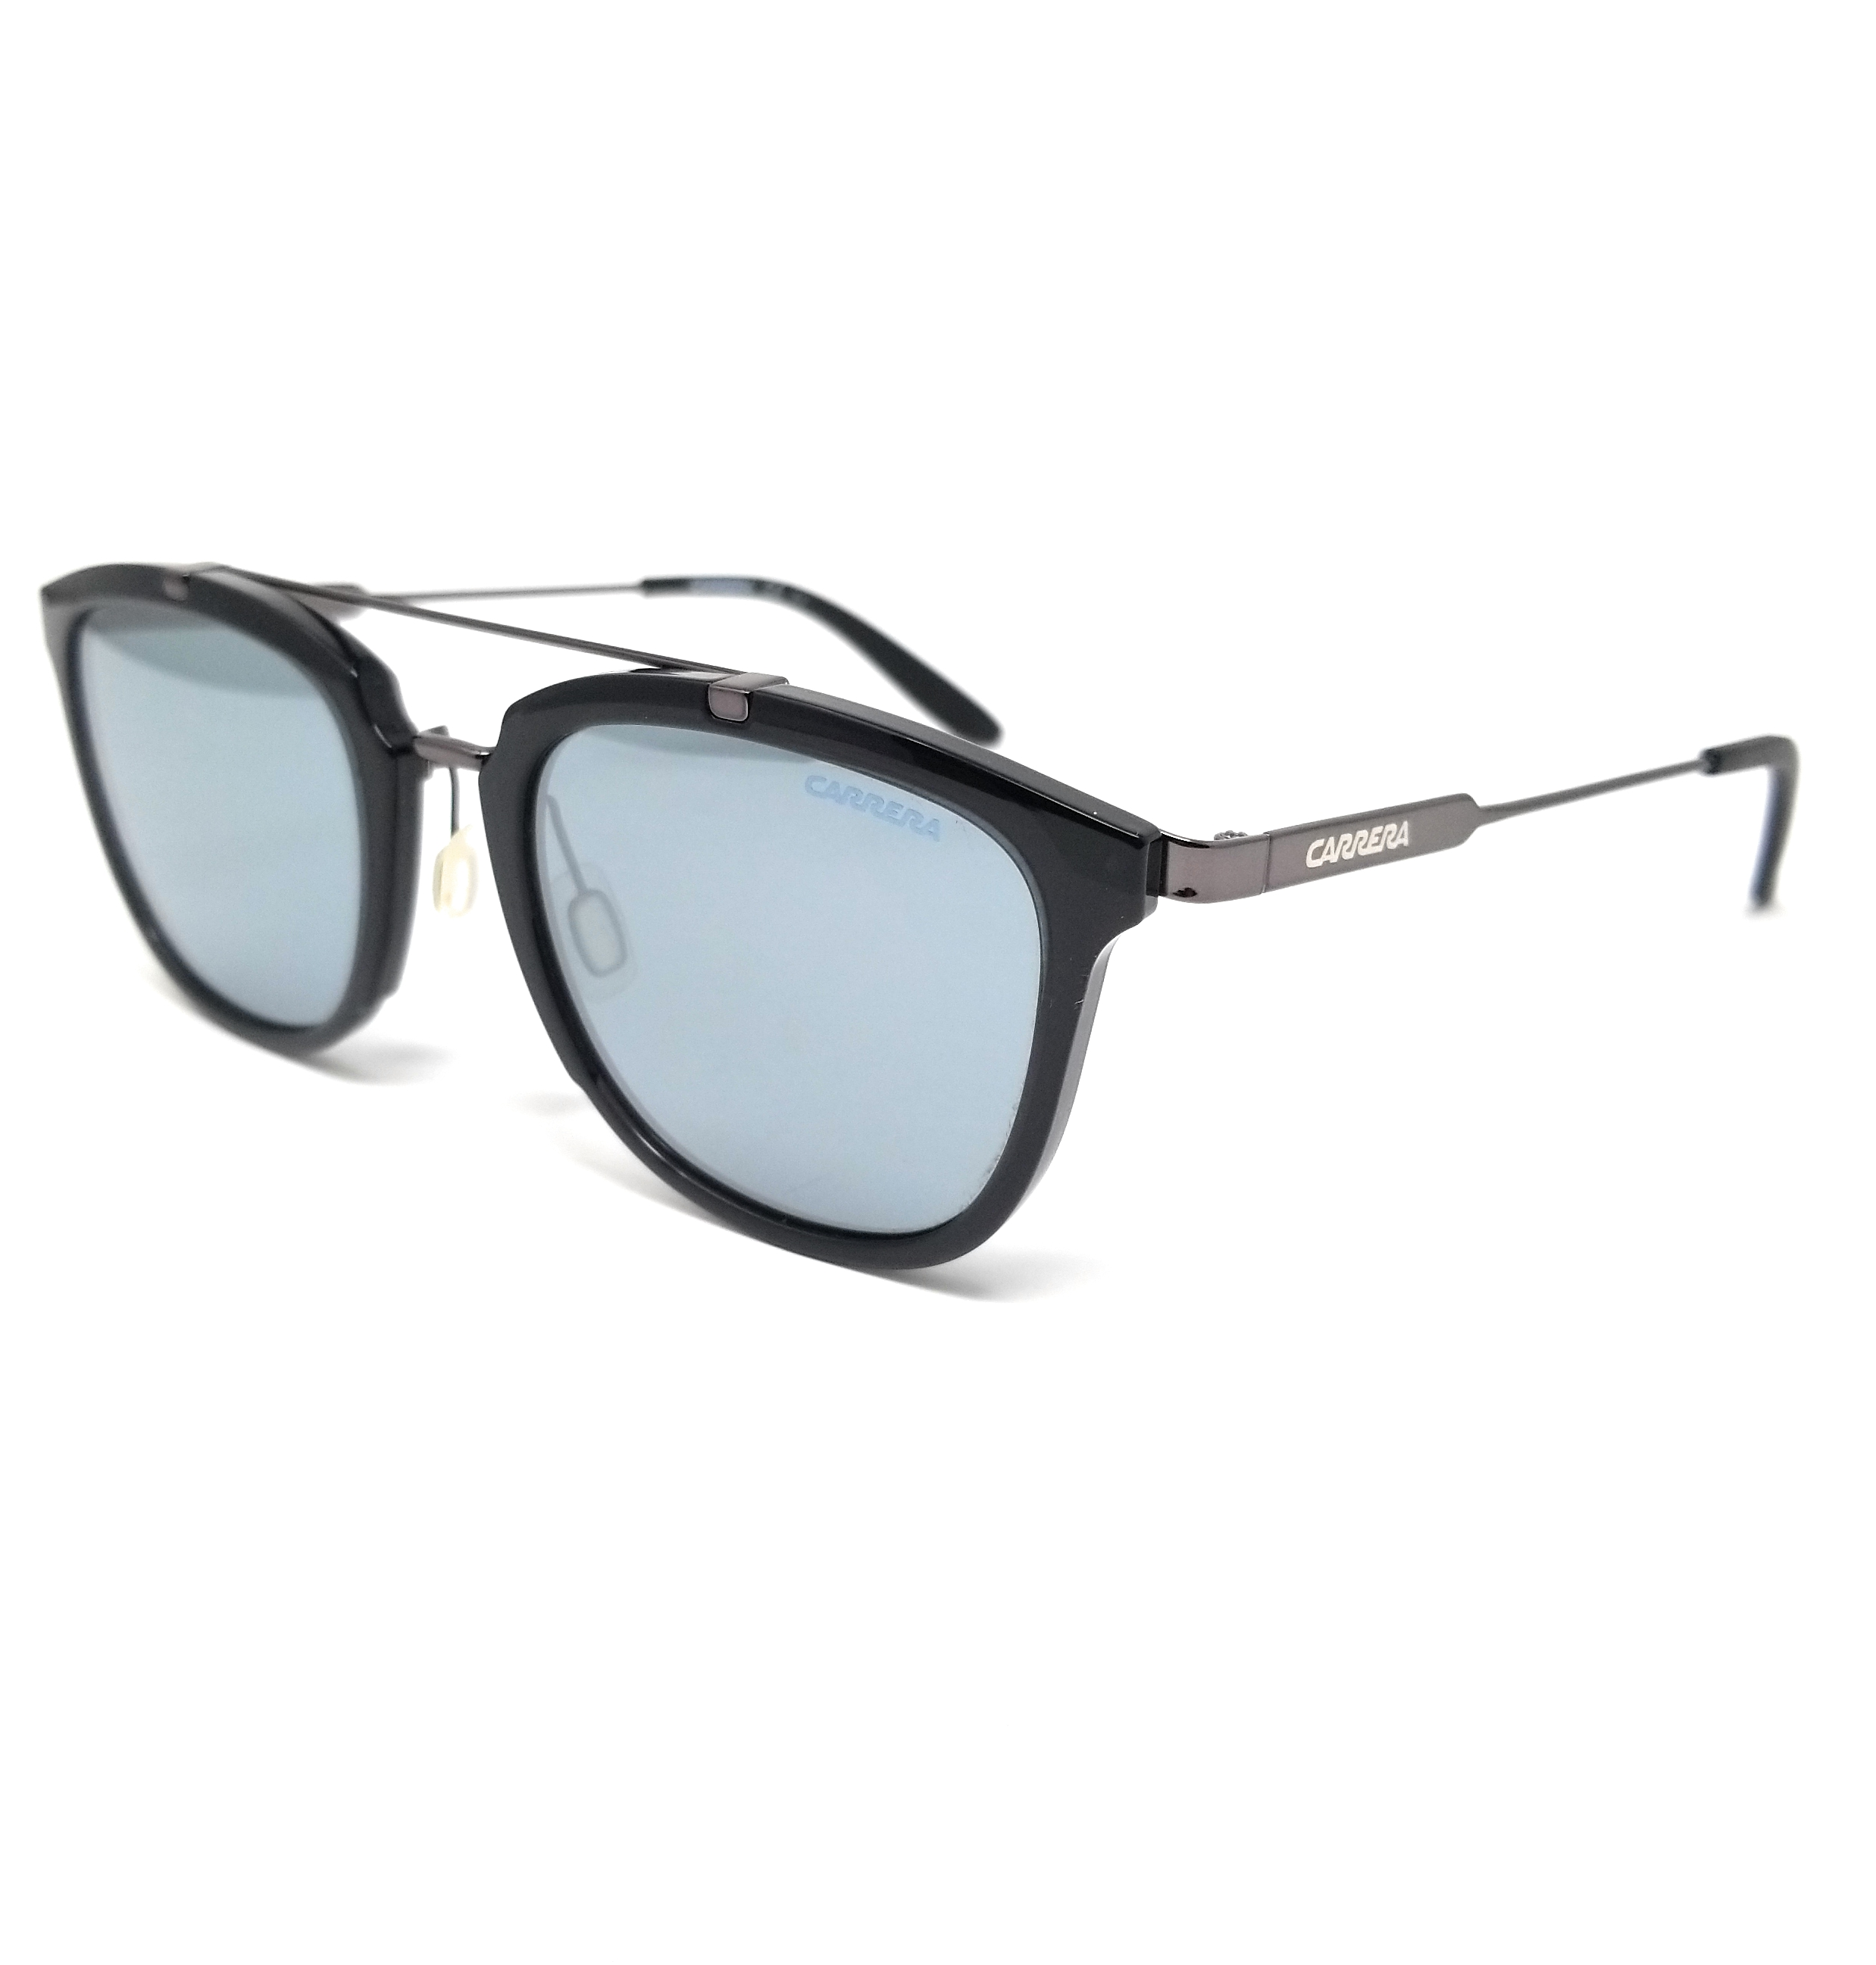 Carrera Sunglasses 127S I48 Grey Ruthenium Square Men/'s 51x21x145